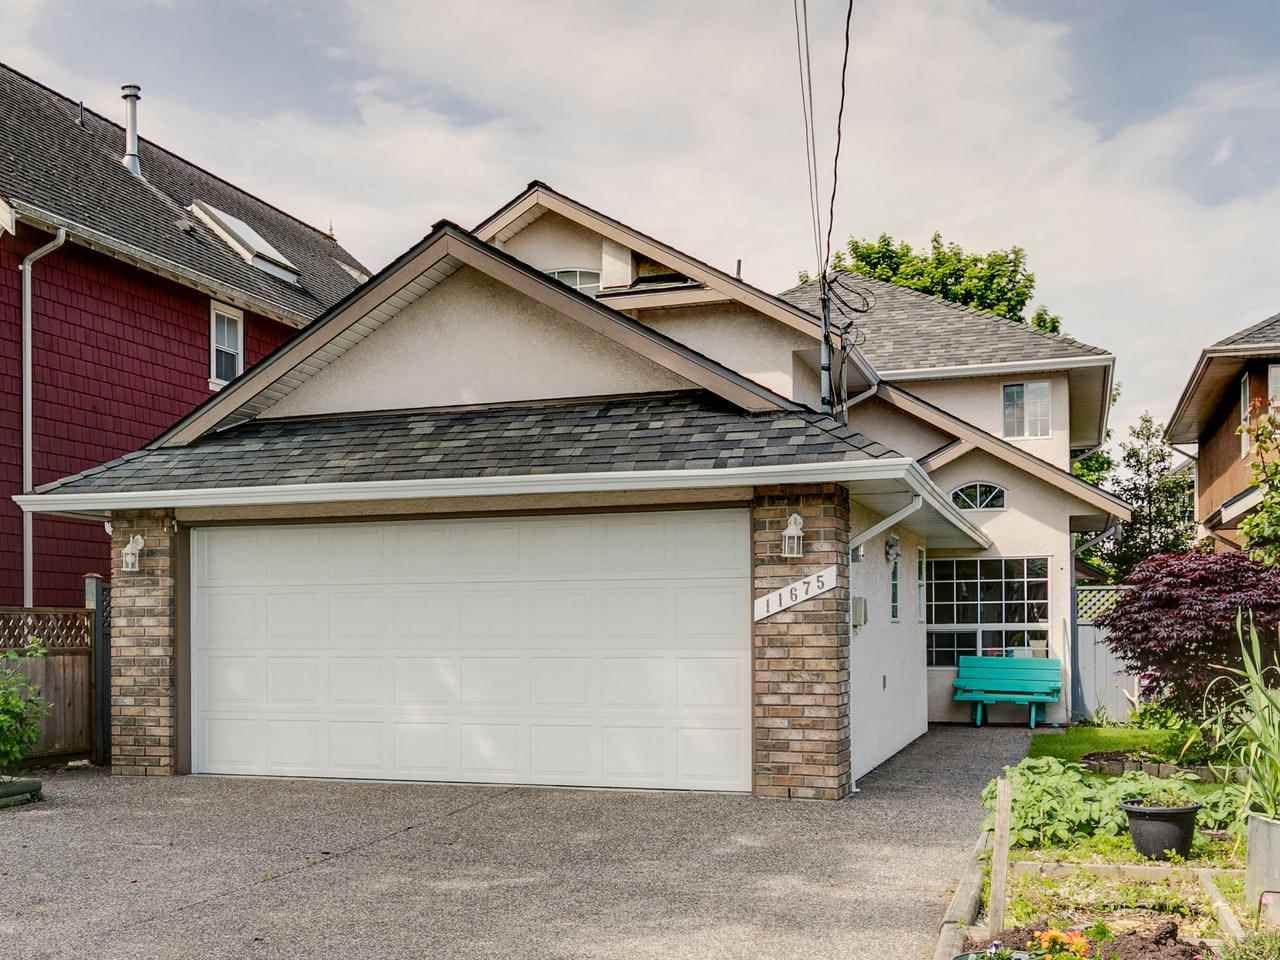 Main Photo: 11675 4TH Avenue in Richmond: Steveston Village House for sale : MLS®# R2456157